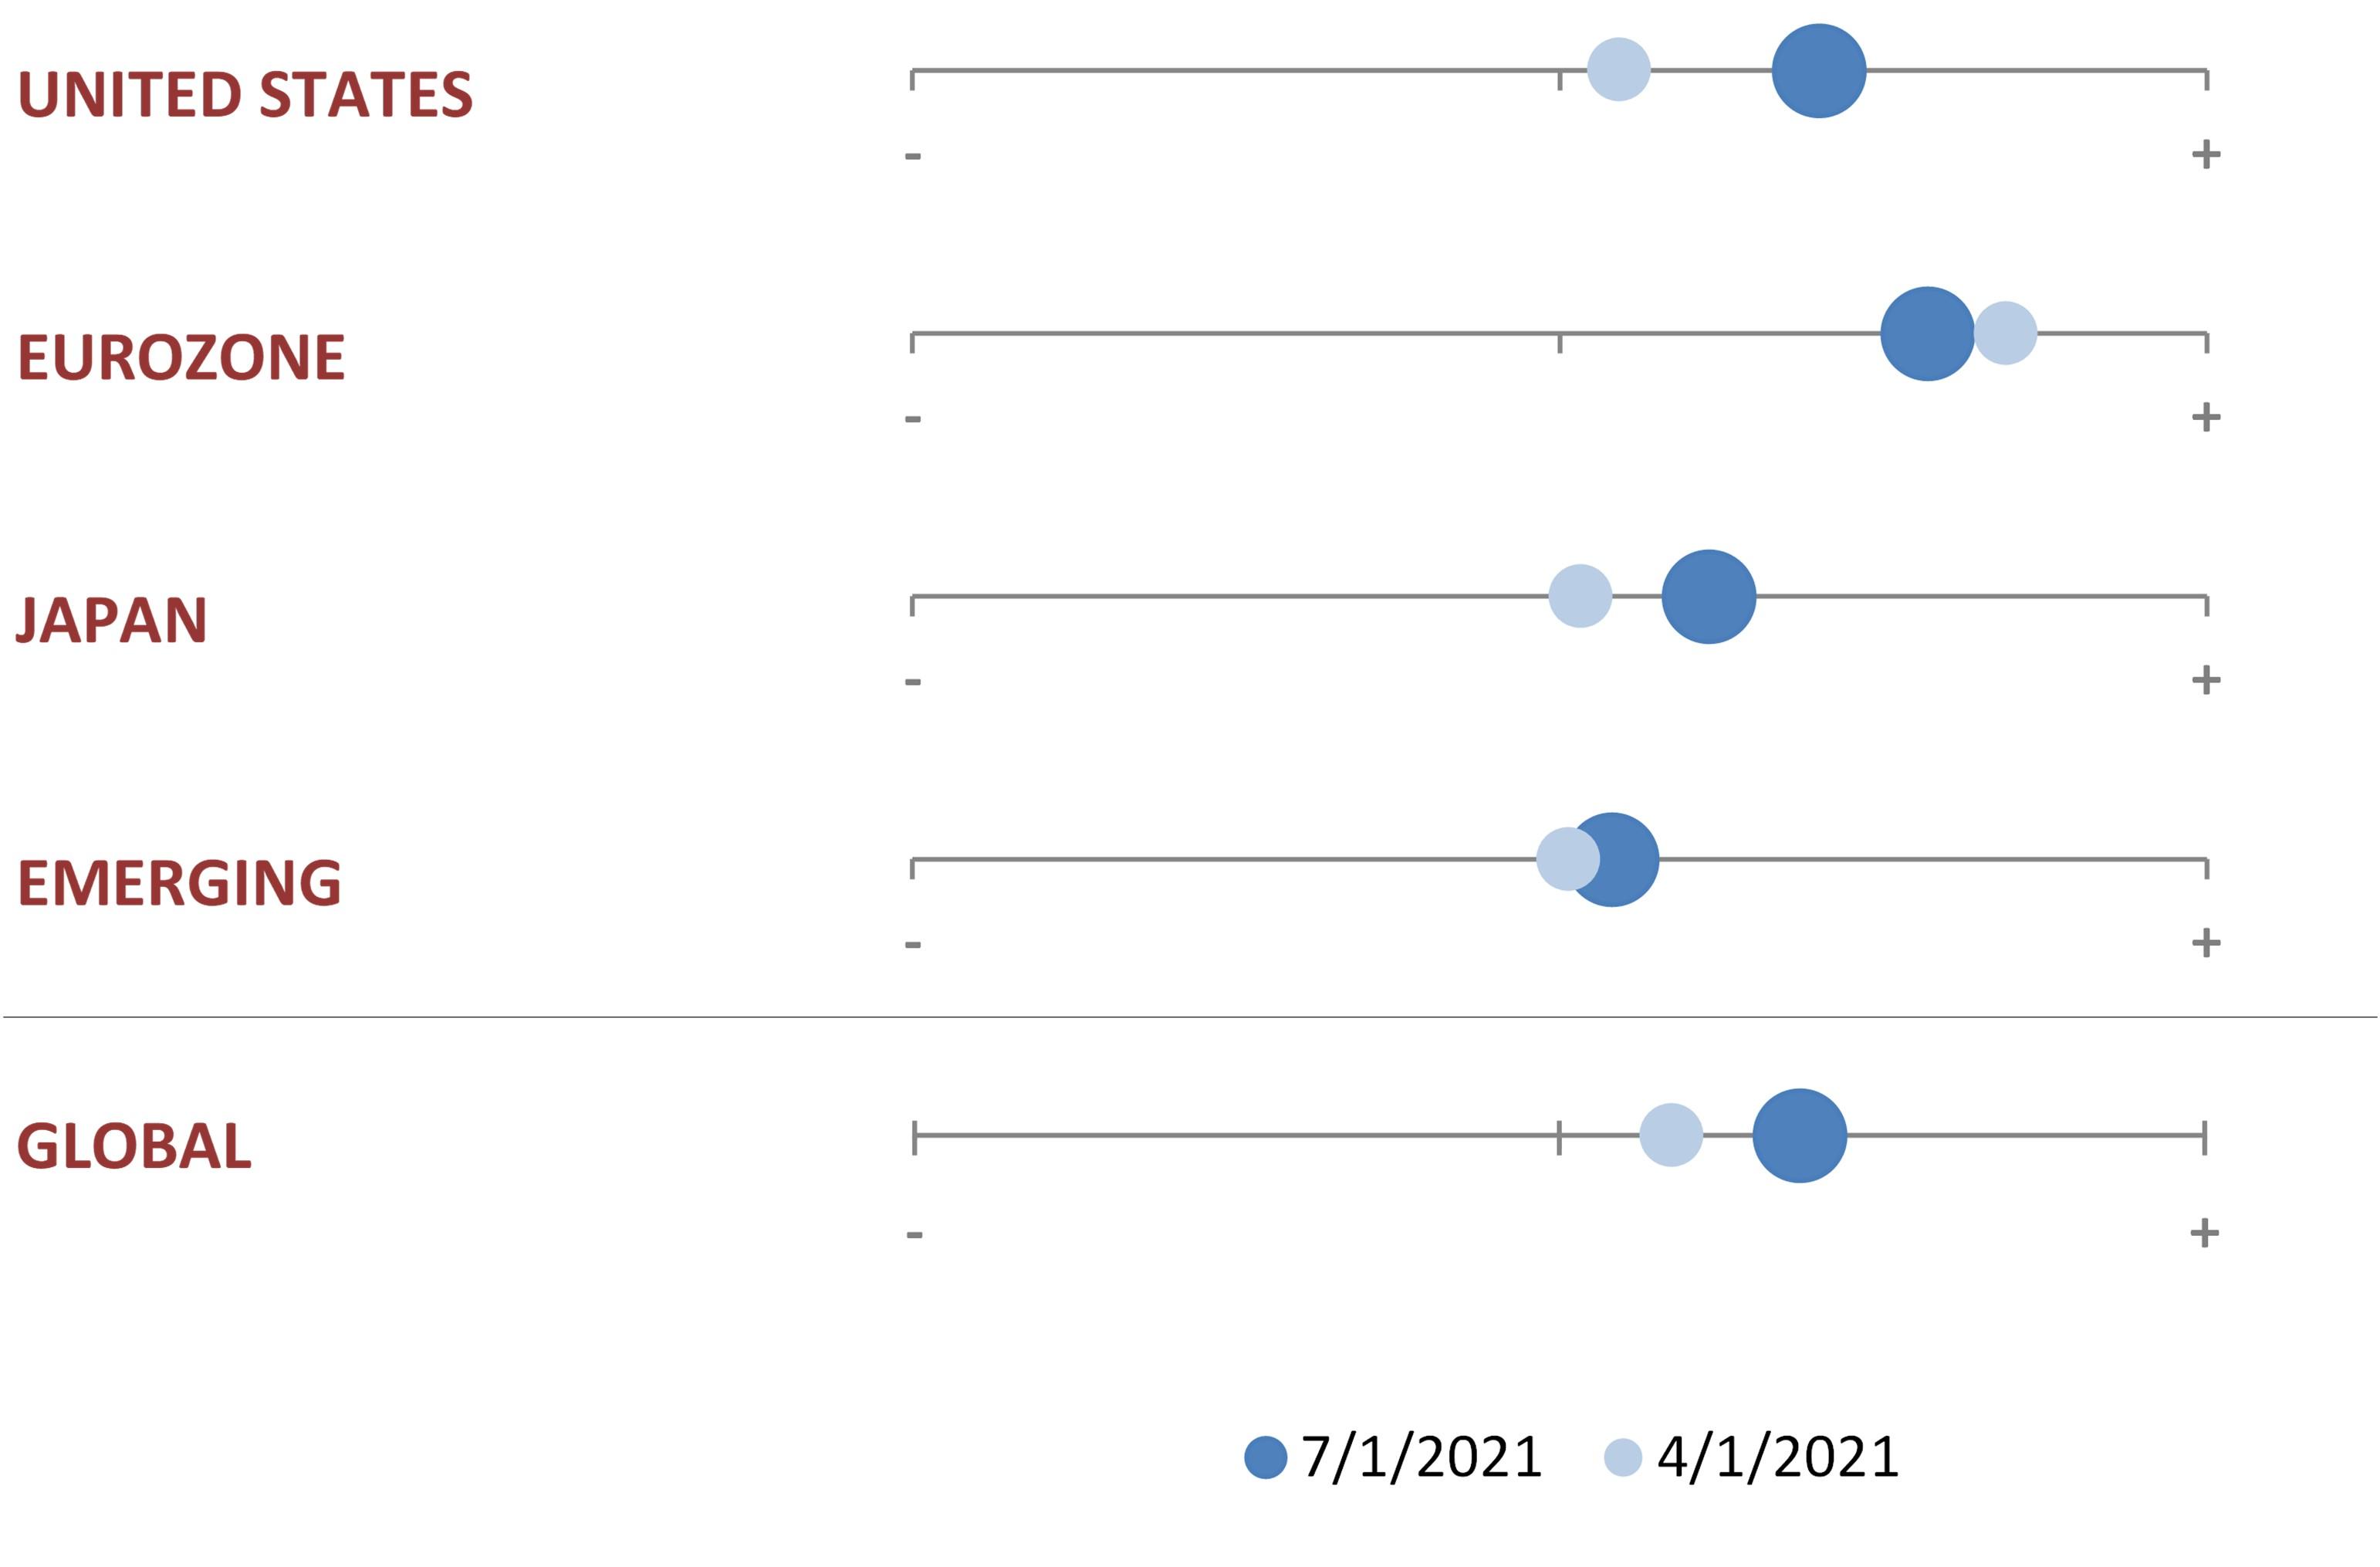 Chart 1: Evolution of equity market fundamentals over 3 months